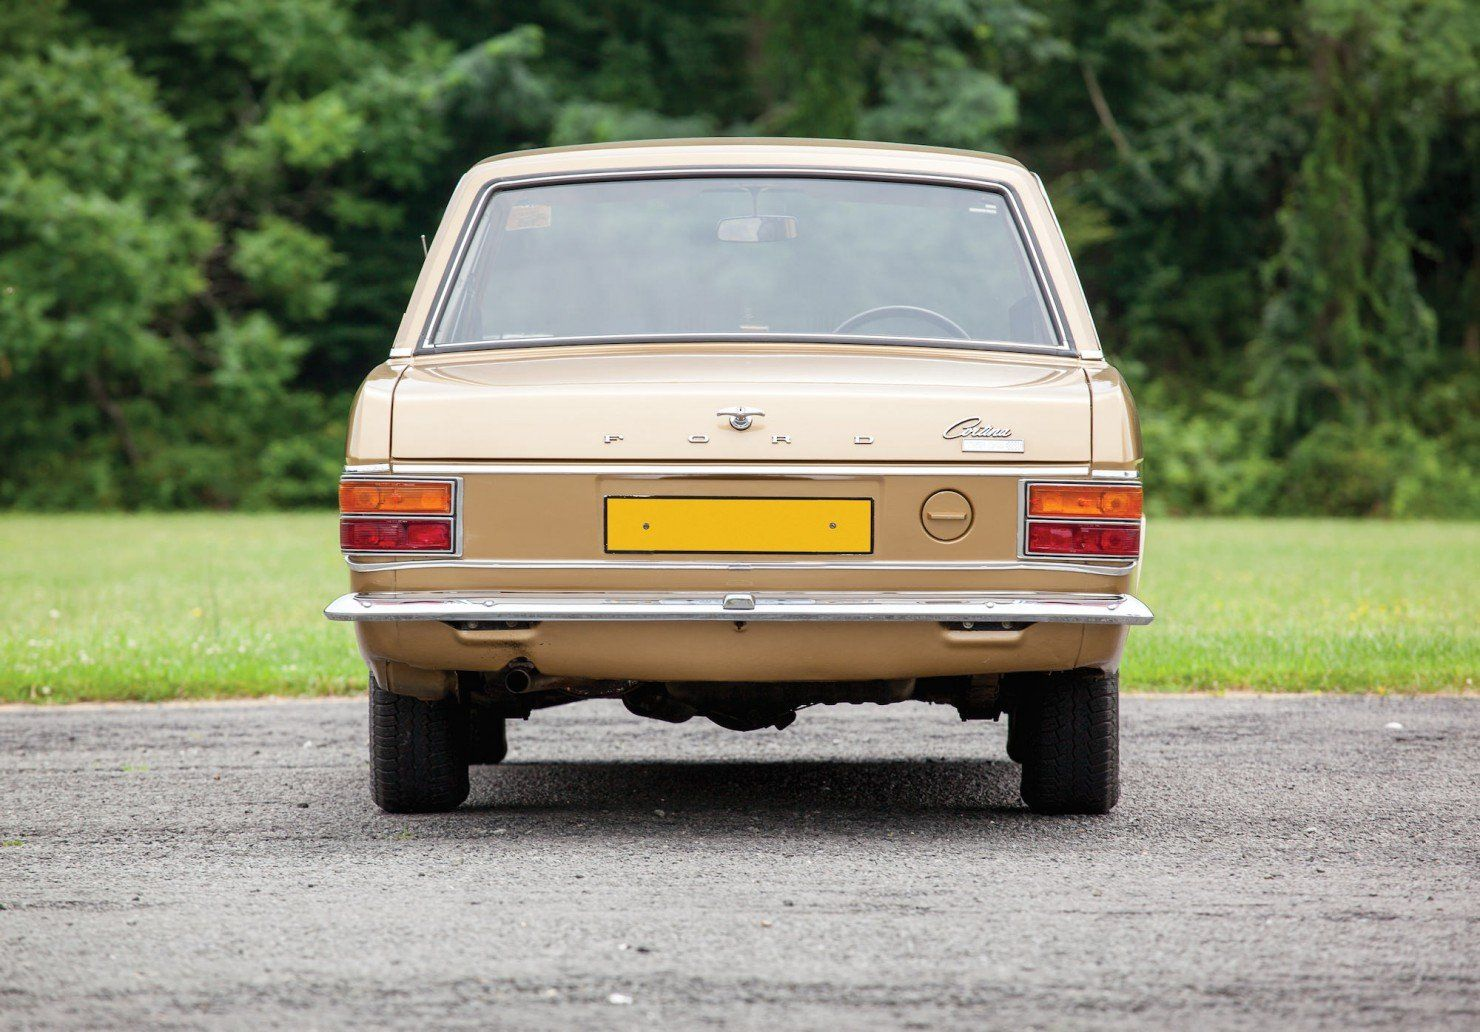 1969 Ford Cortina Lotus Mk 2 2020 画像あり